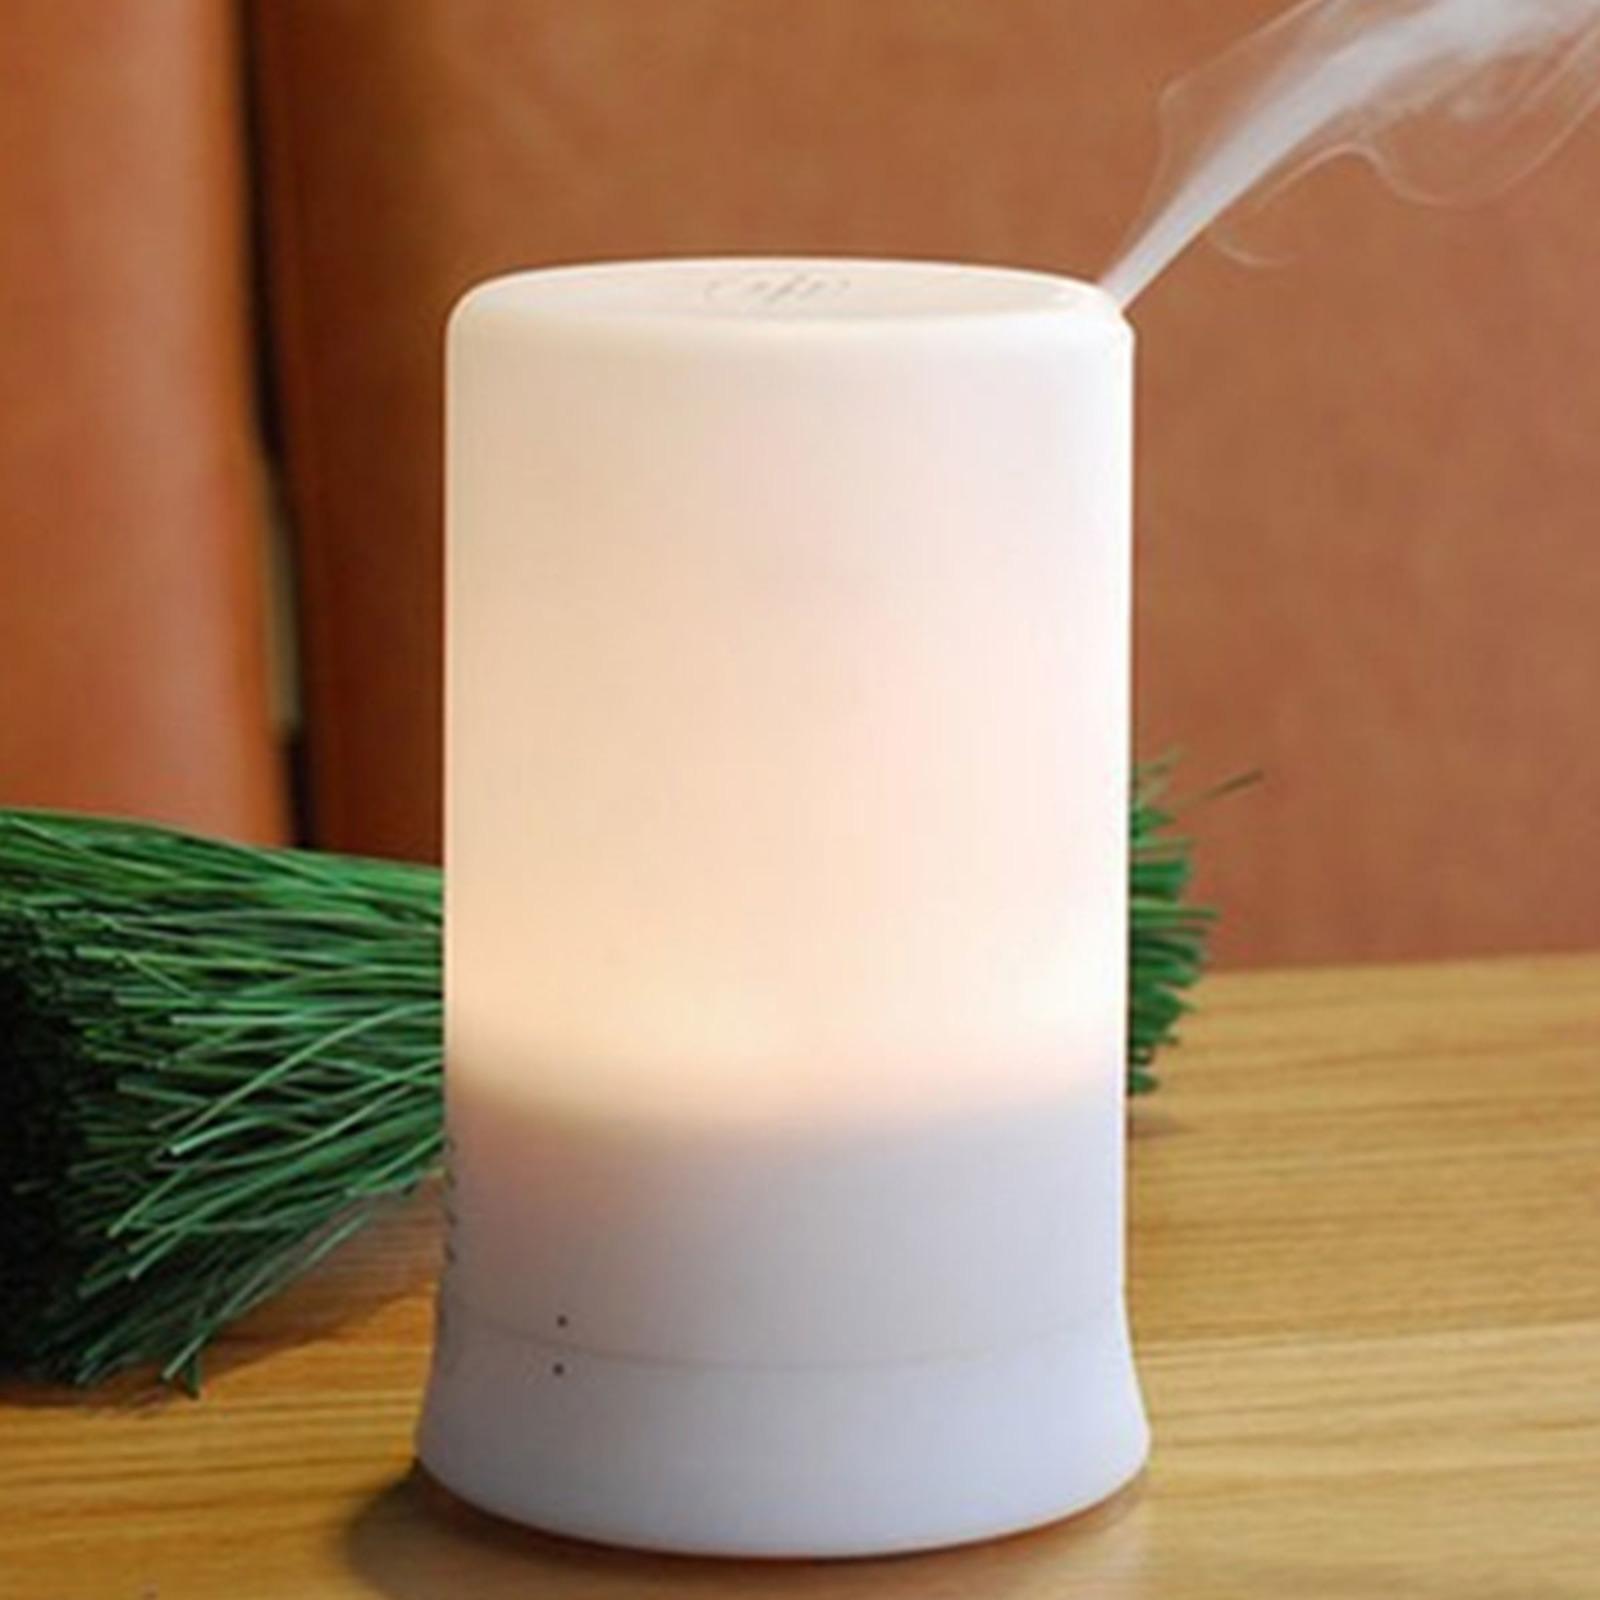 Biofinest A2 Ultrasonic Aroma Diffuser Humidifier